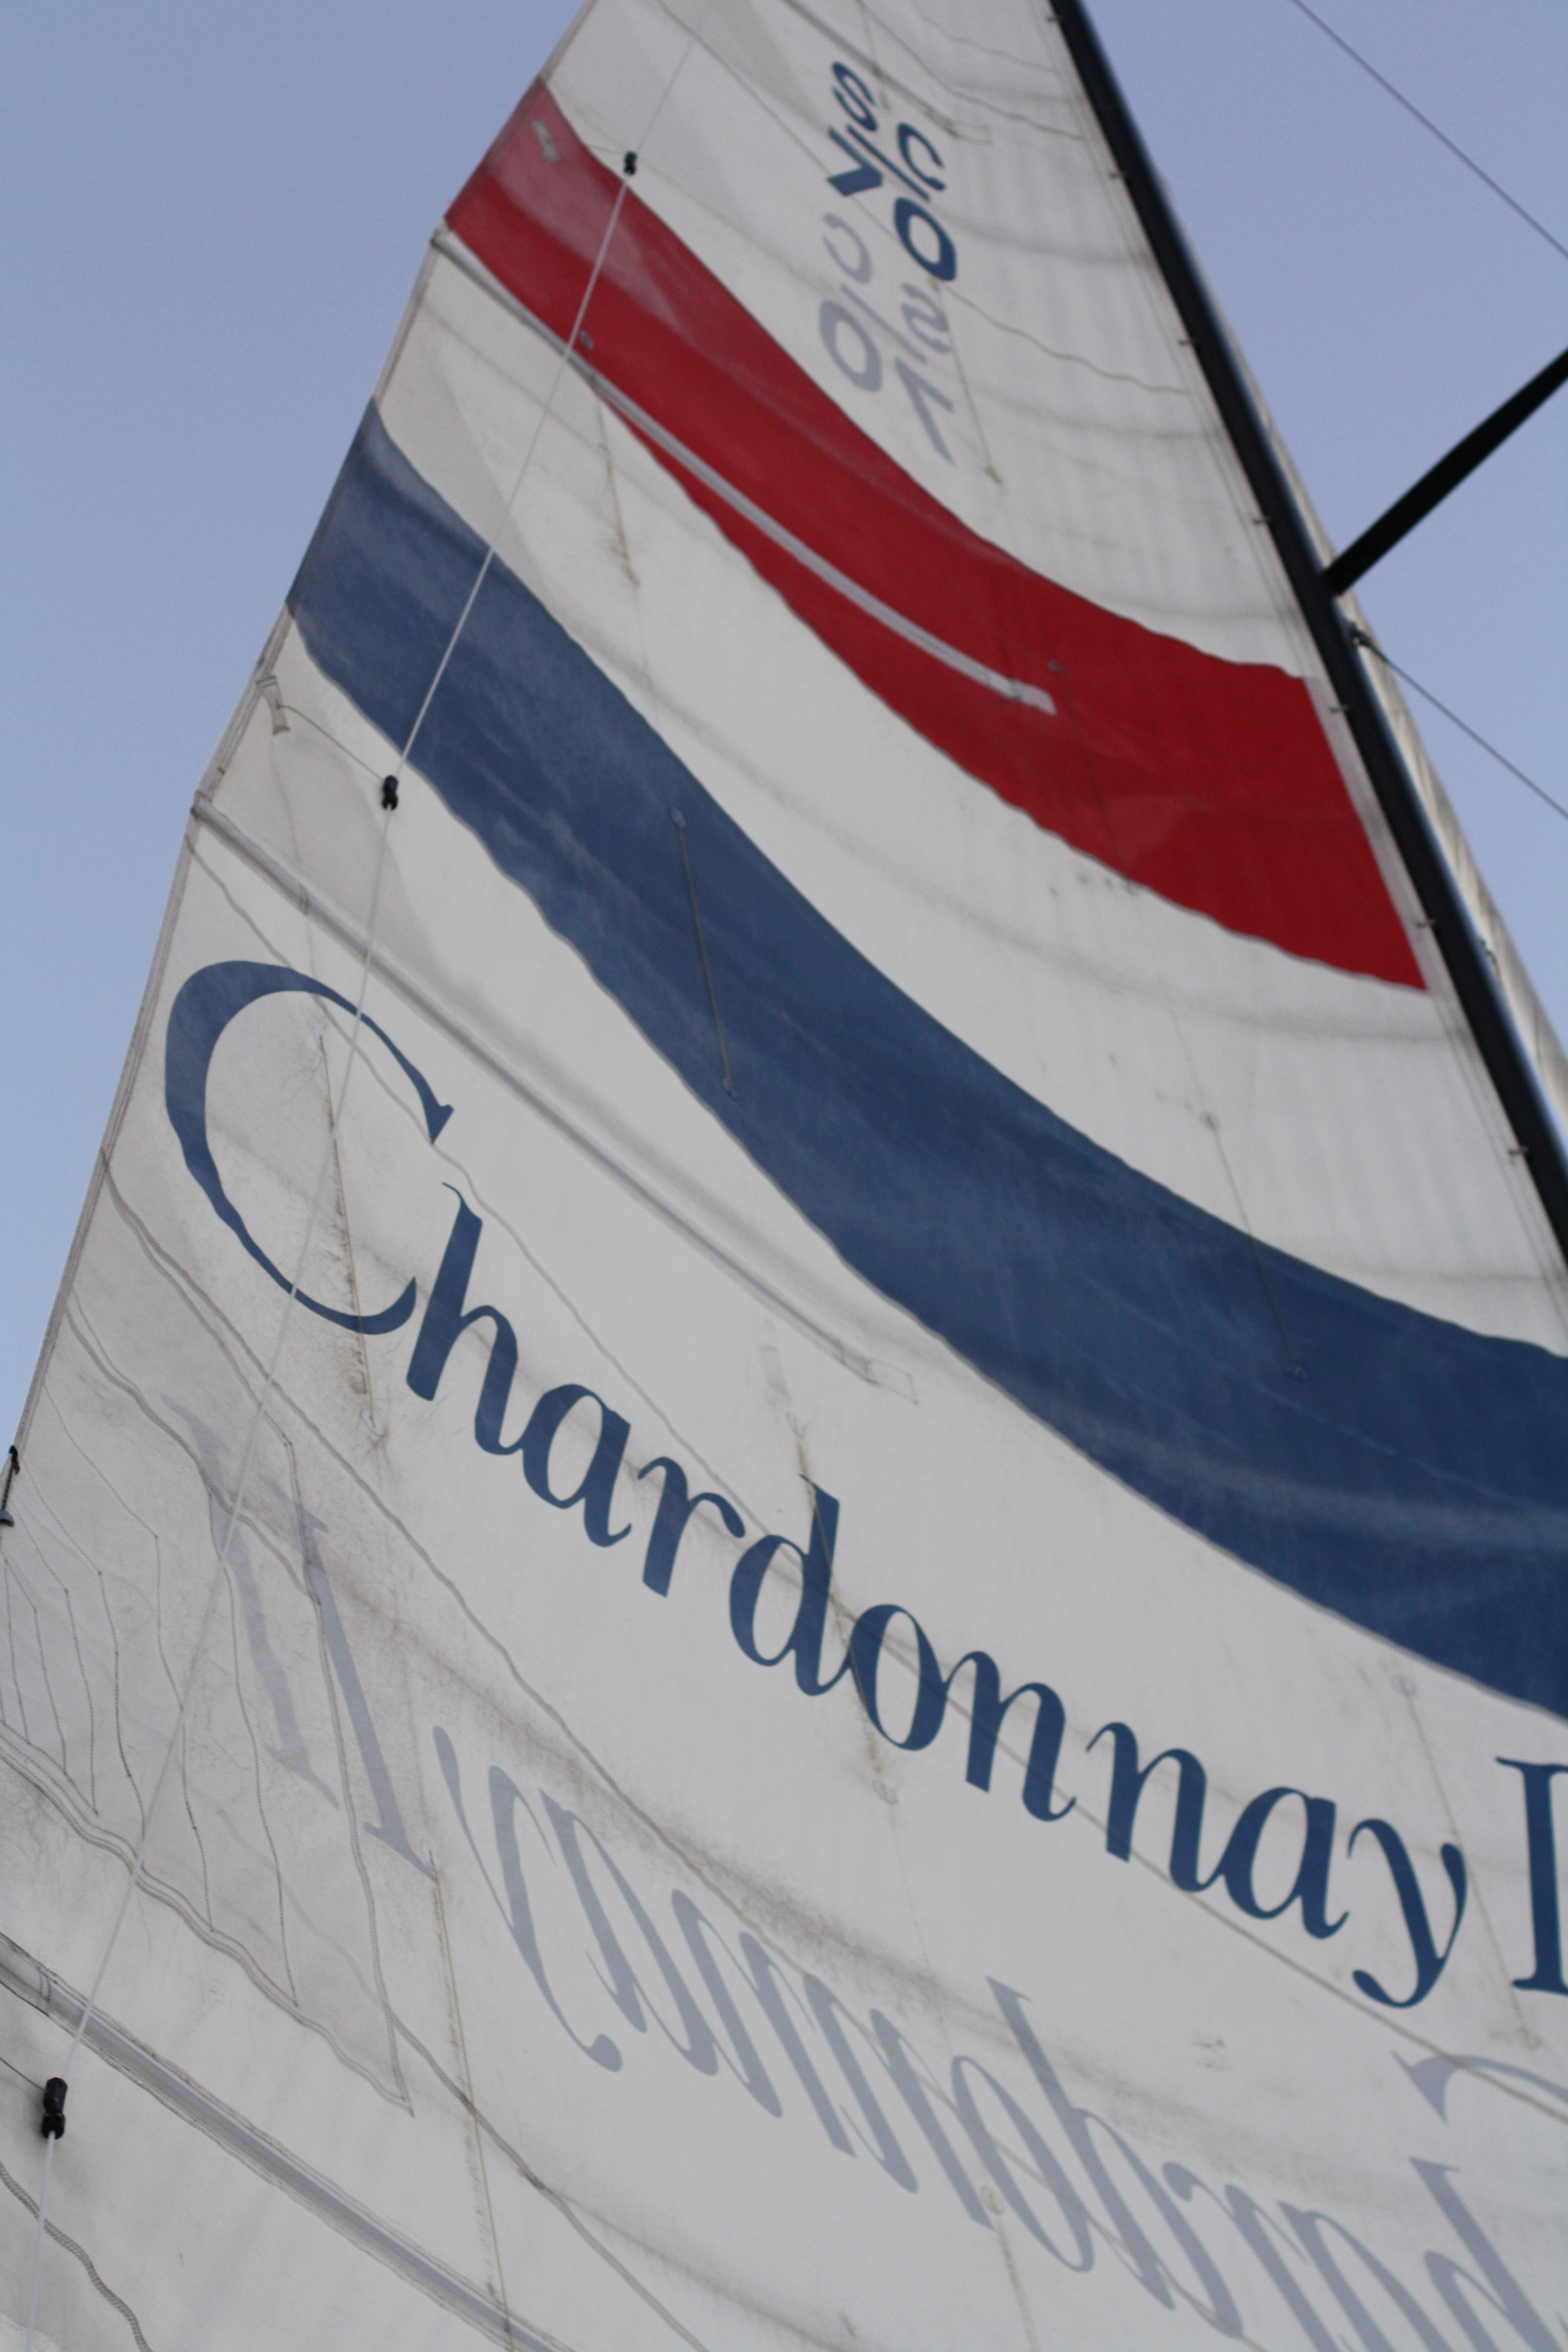 Chardonnay-Sail_heatherbyhand.JPG